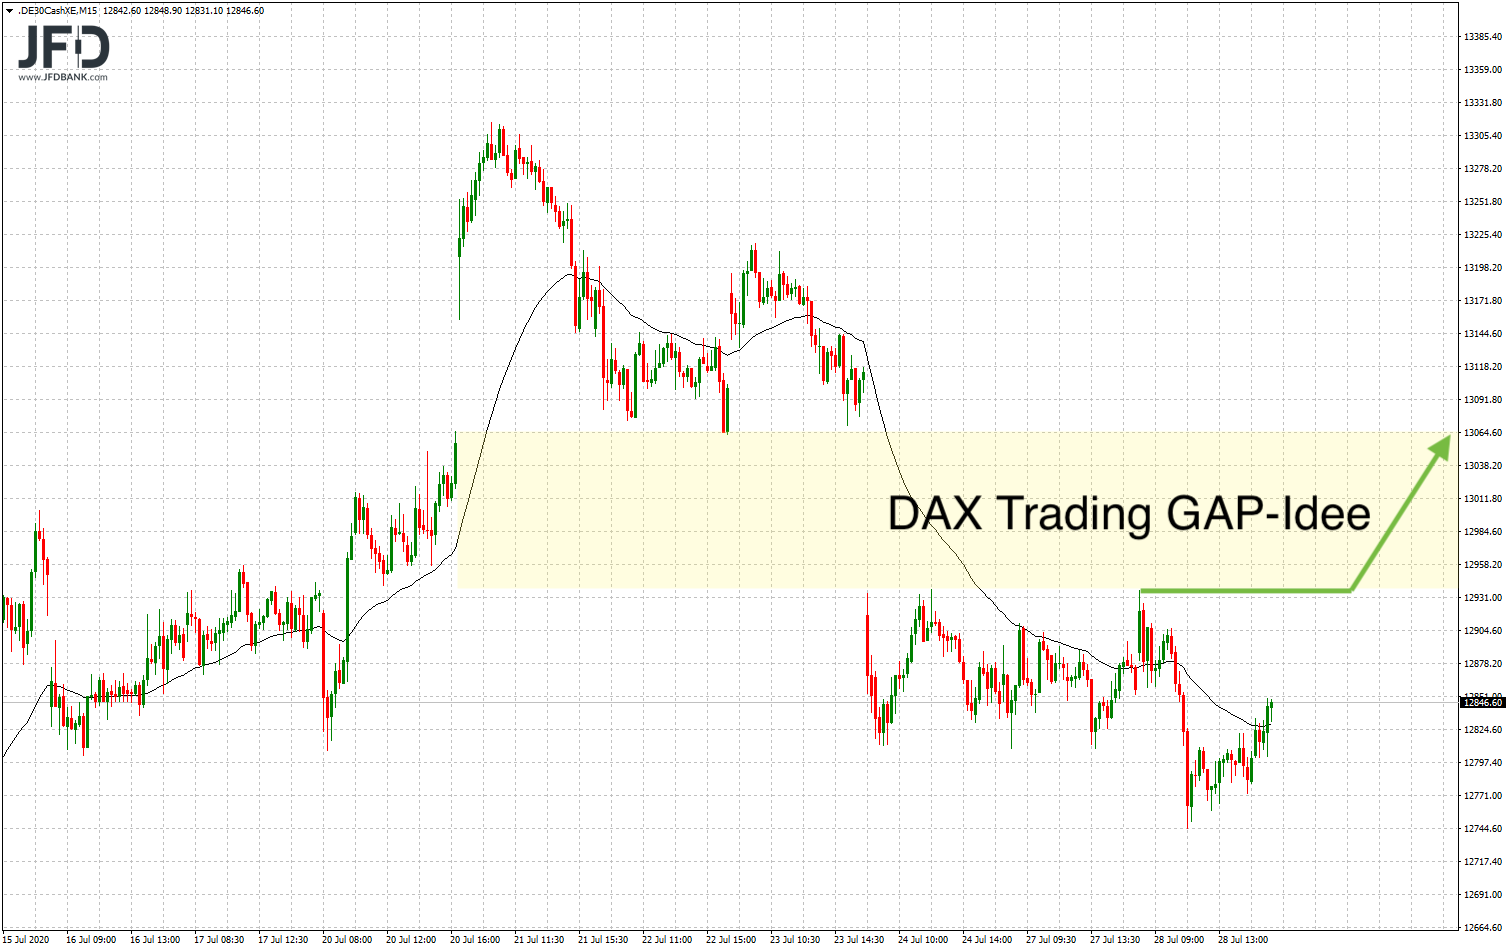 Erneut-wenig-Bewegung-am-Tag-vor-der-FED-heute-gilt-es-im-DAX-Kommentar-JFD-Bank-GodmodeTrader.de-4